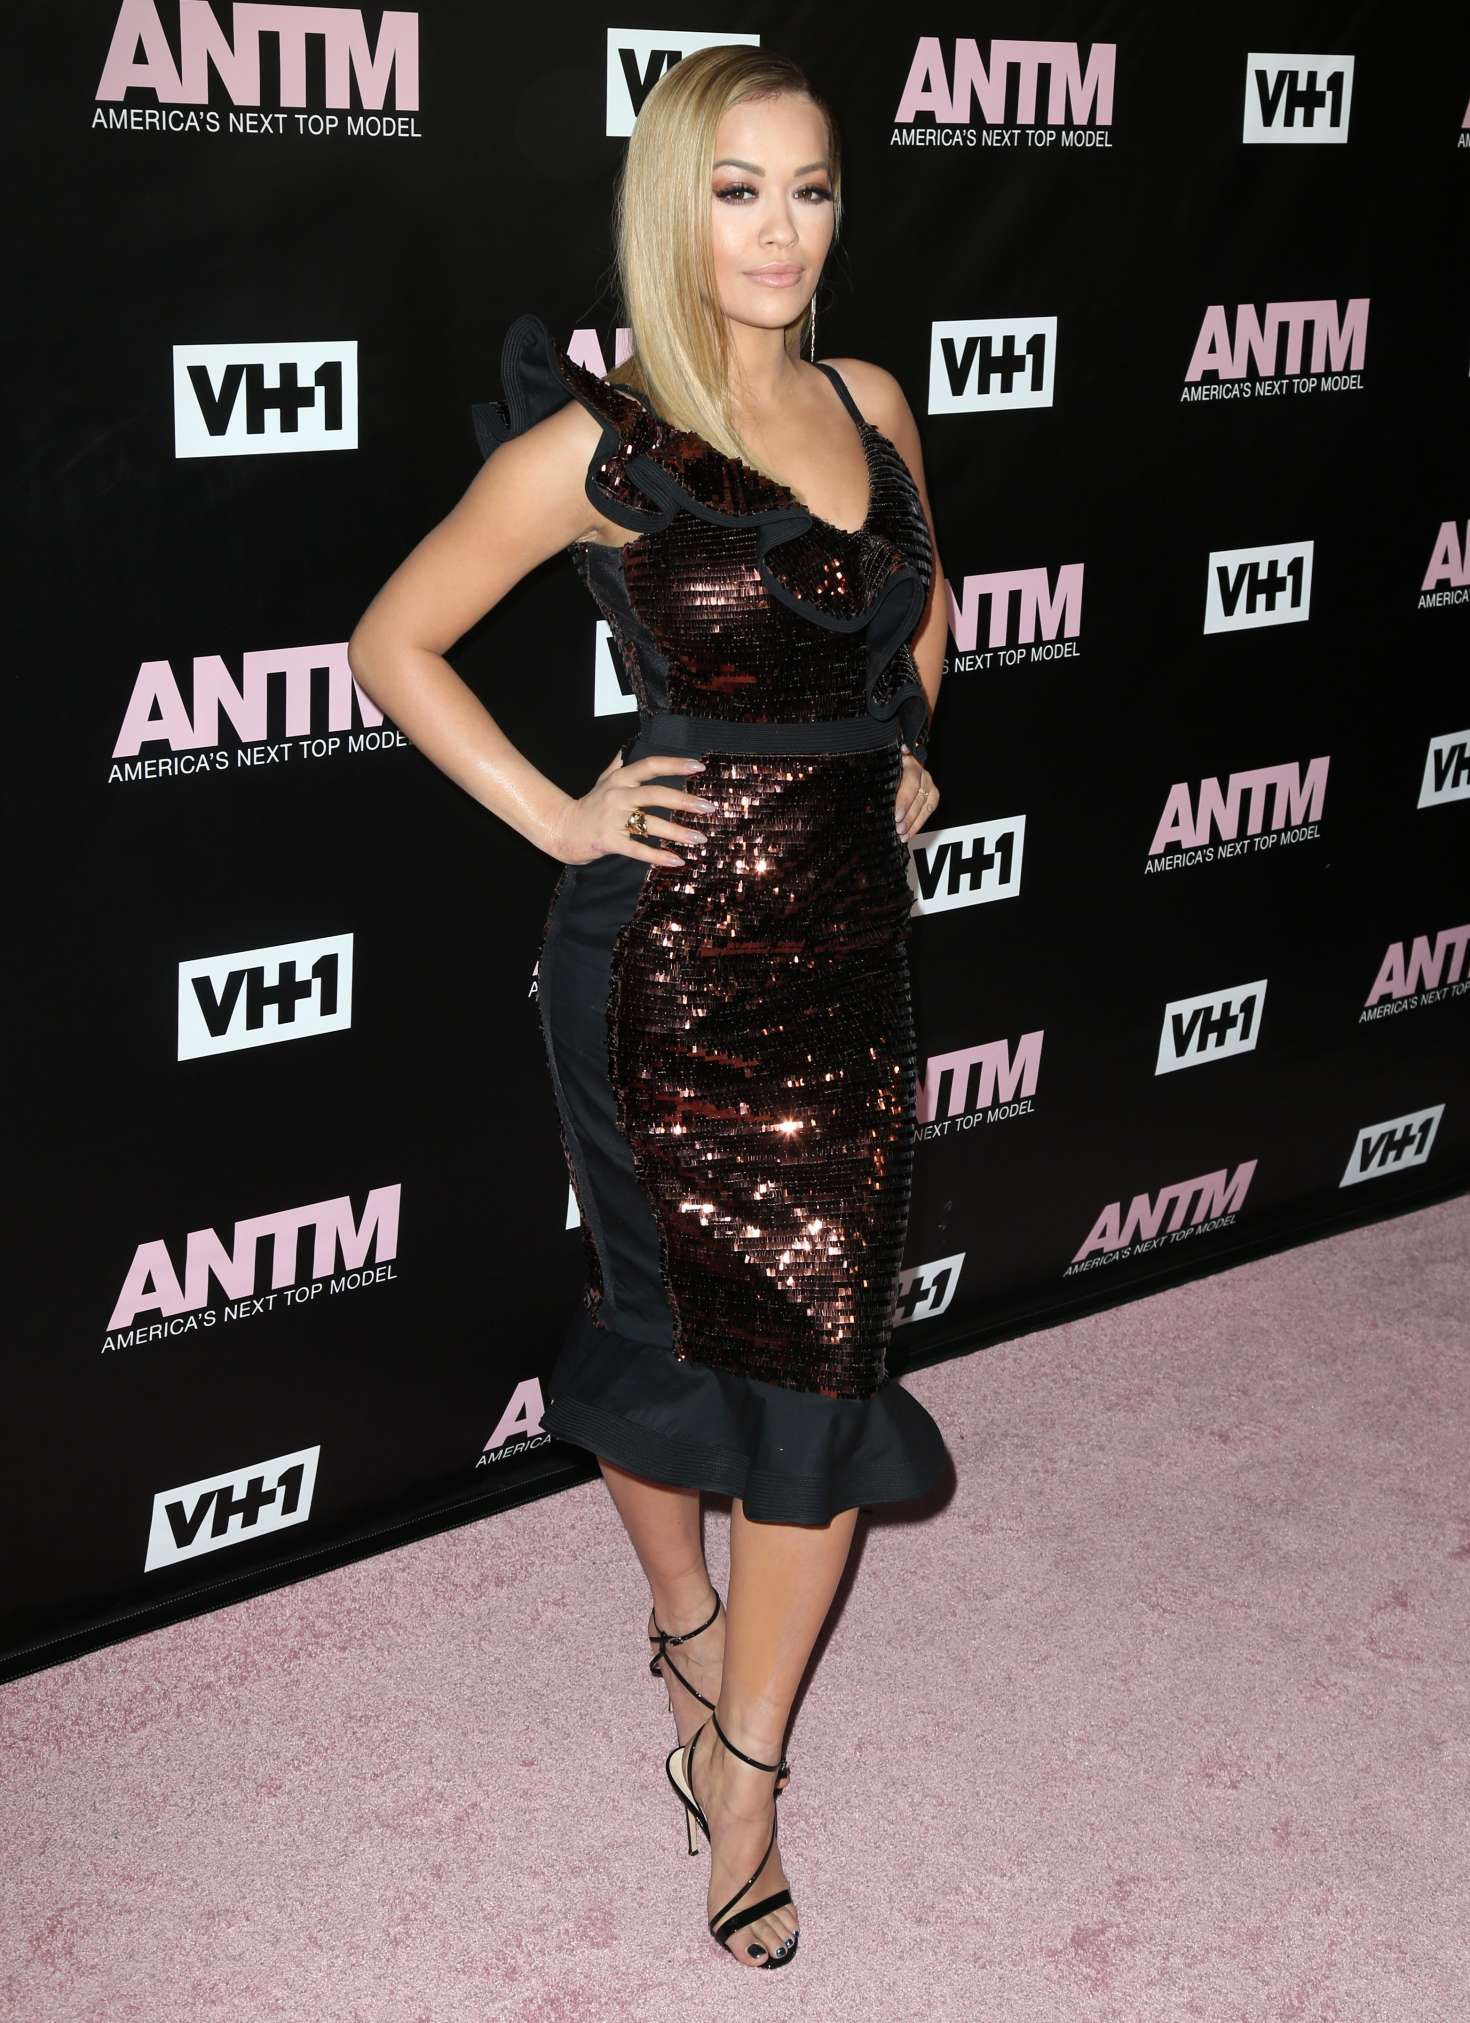 Rita Ora 2016 : Rita Ora: Americas Next Top Model Premiere Party -09